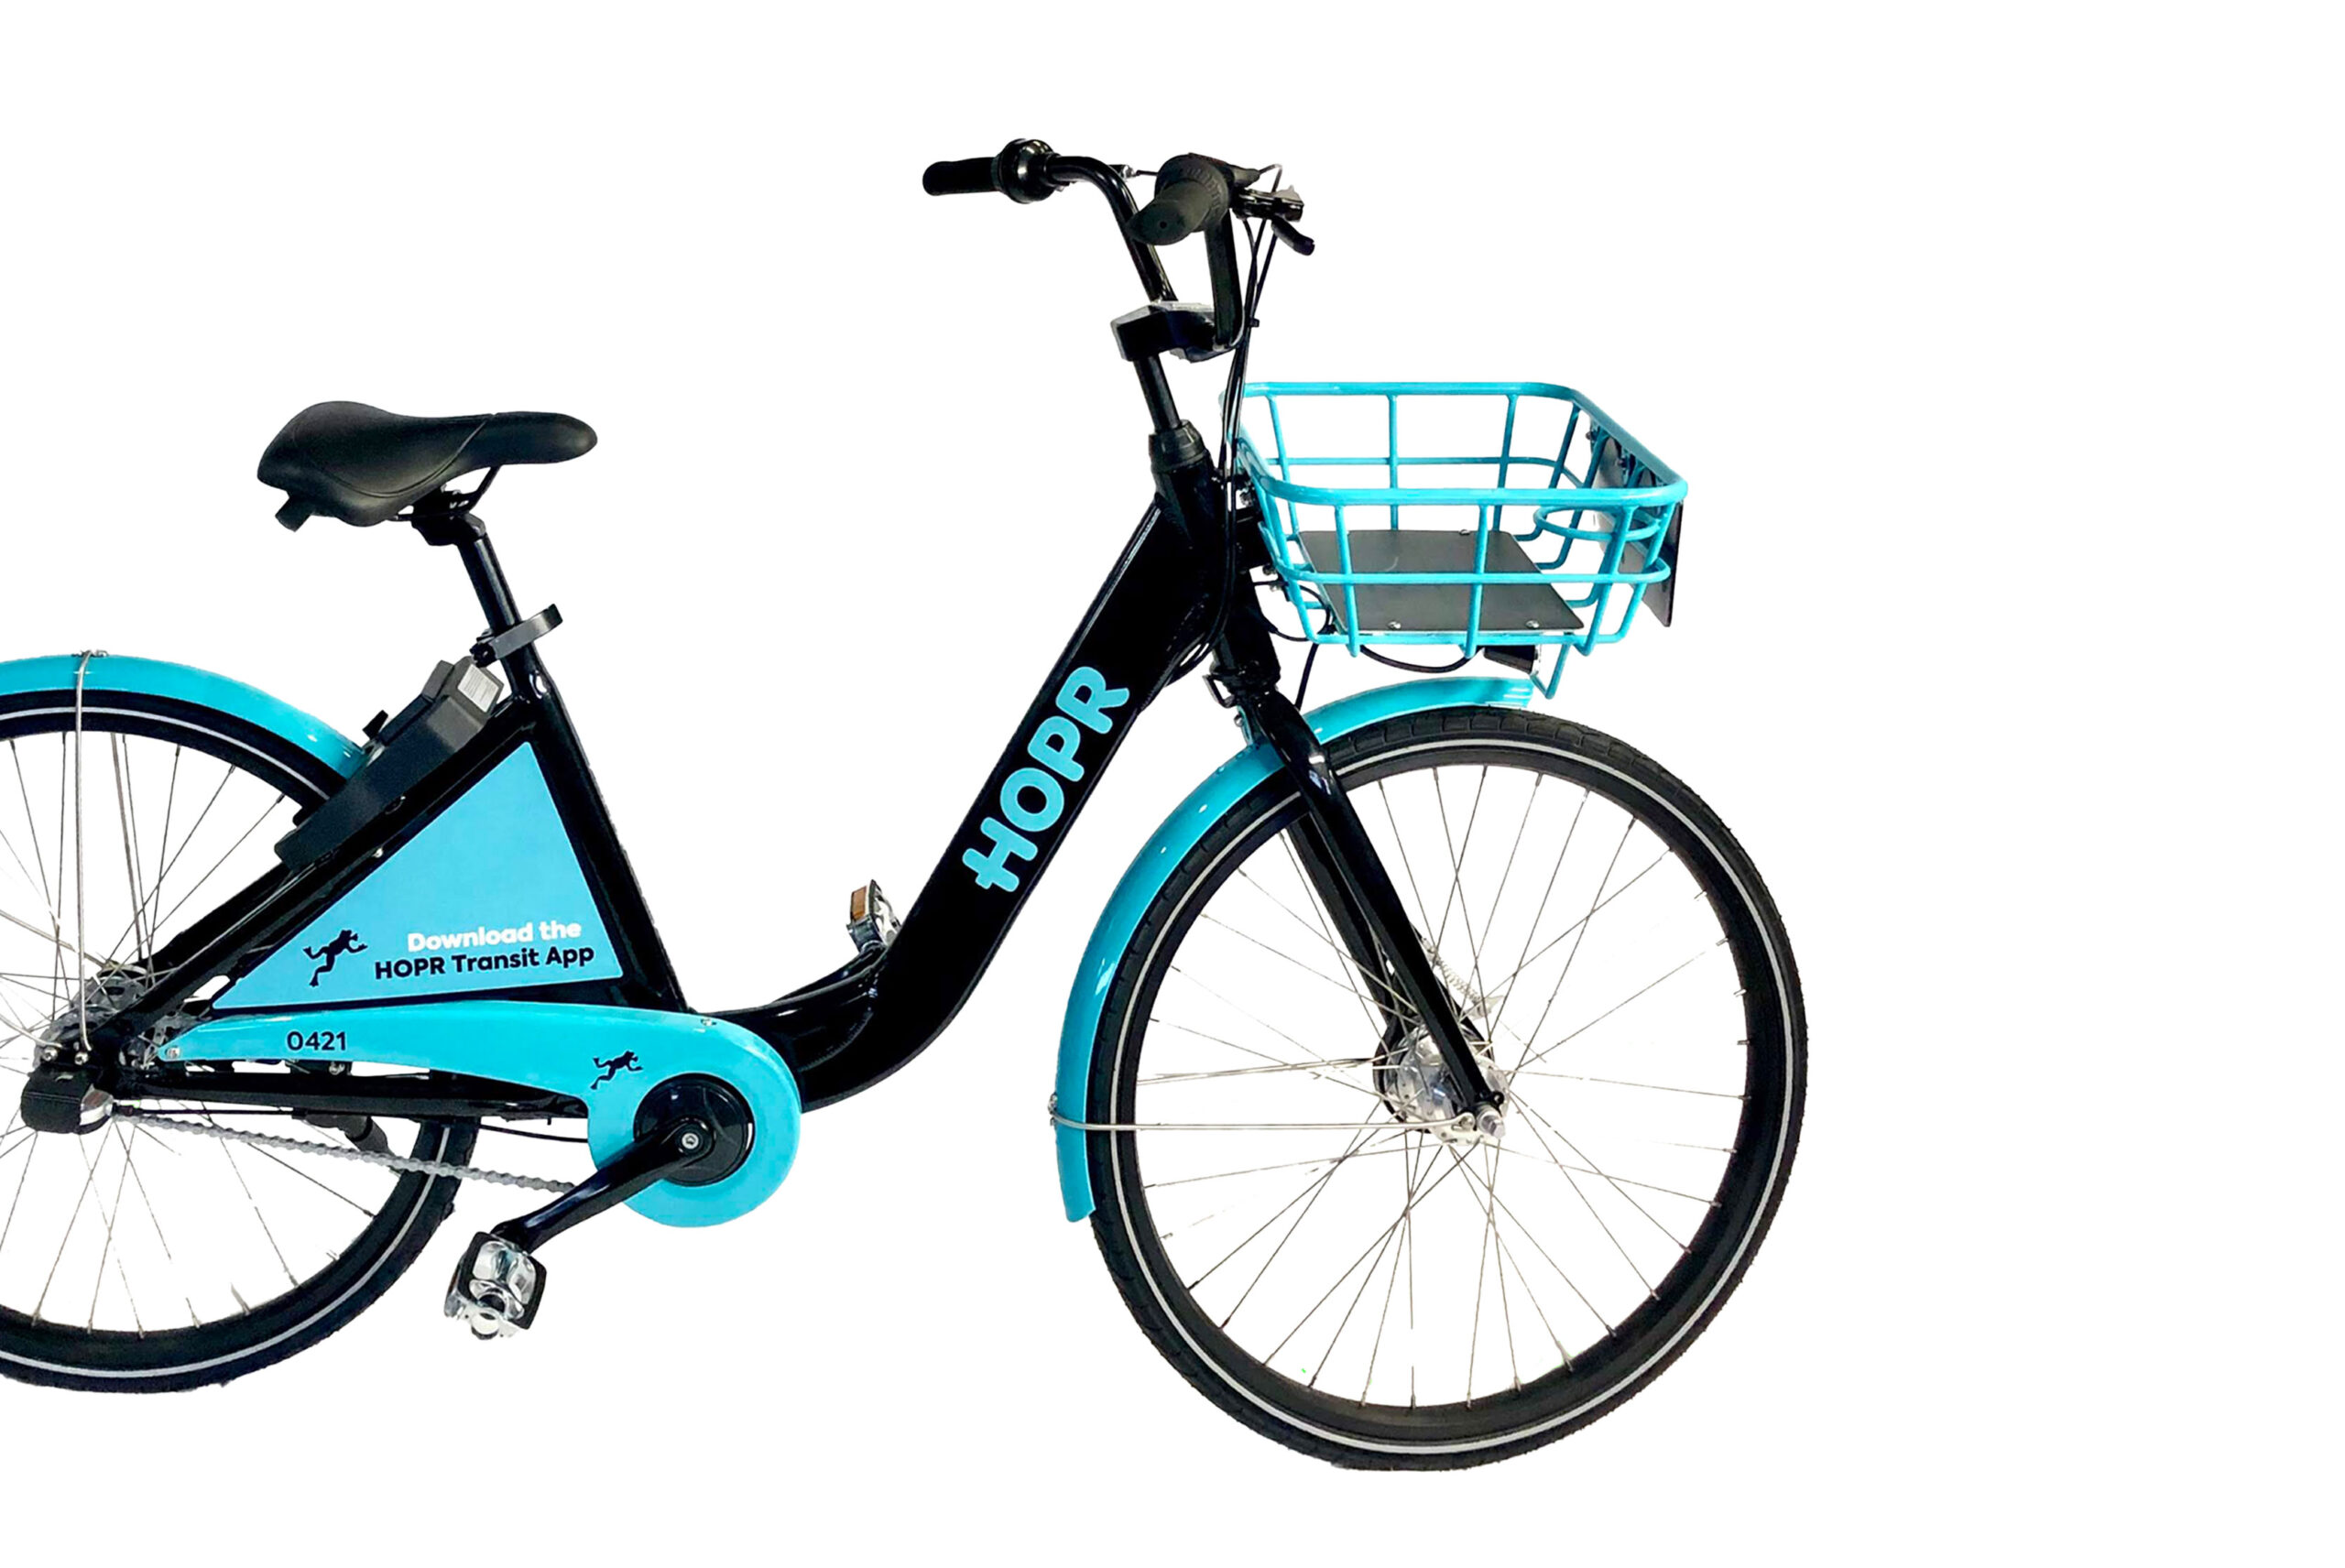 HOPR 3 pedal bike